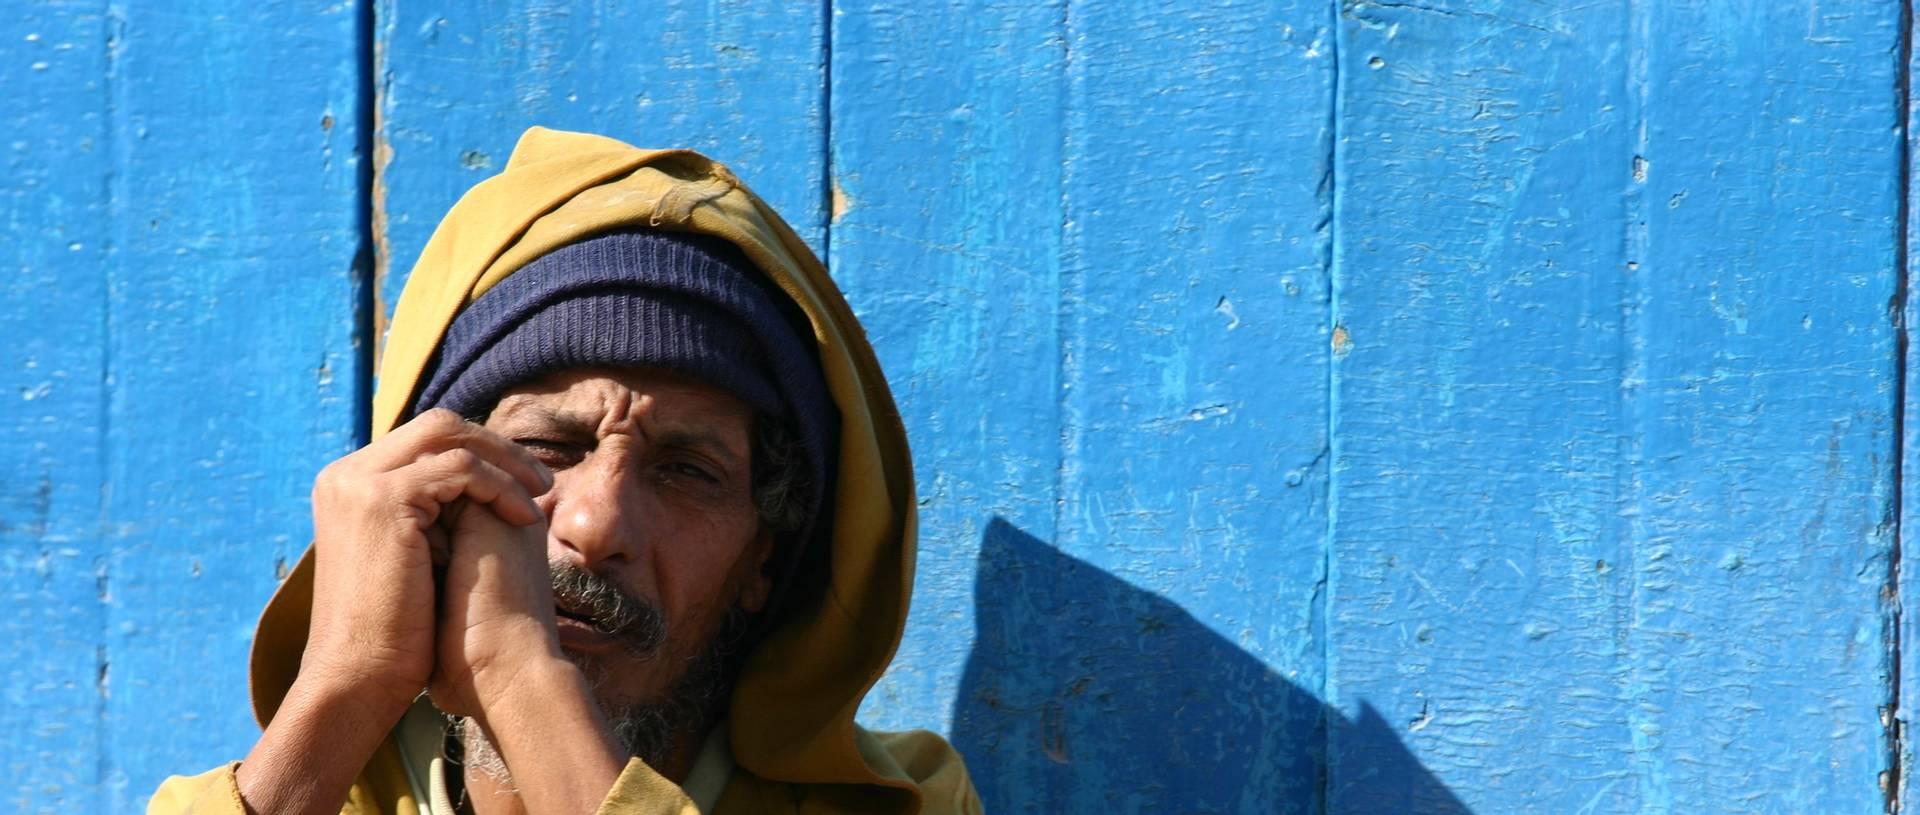 Man In Morrocco